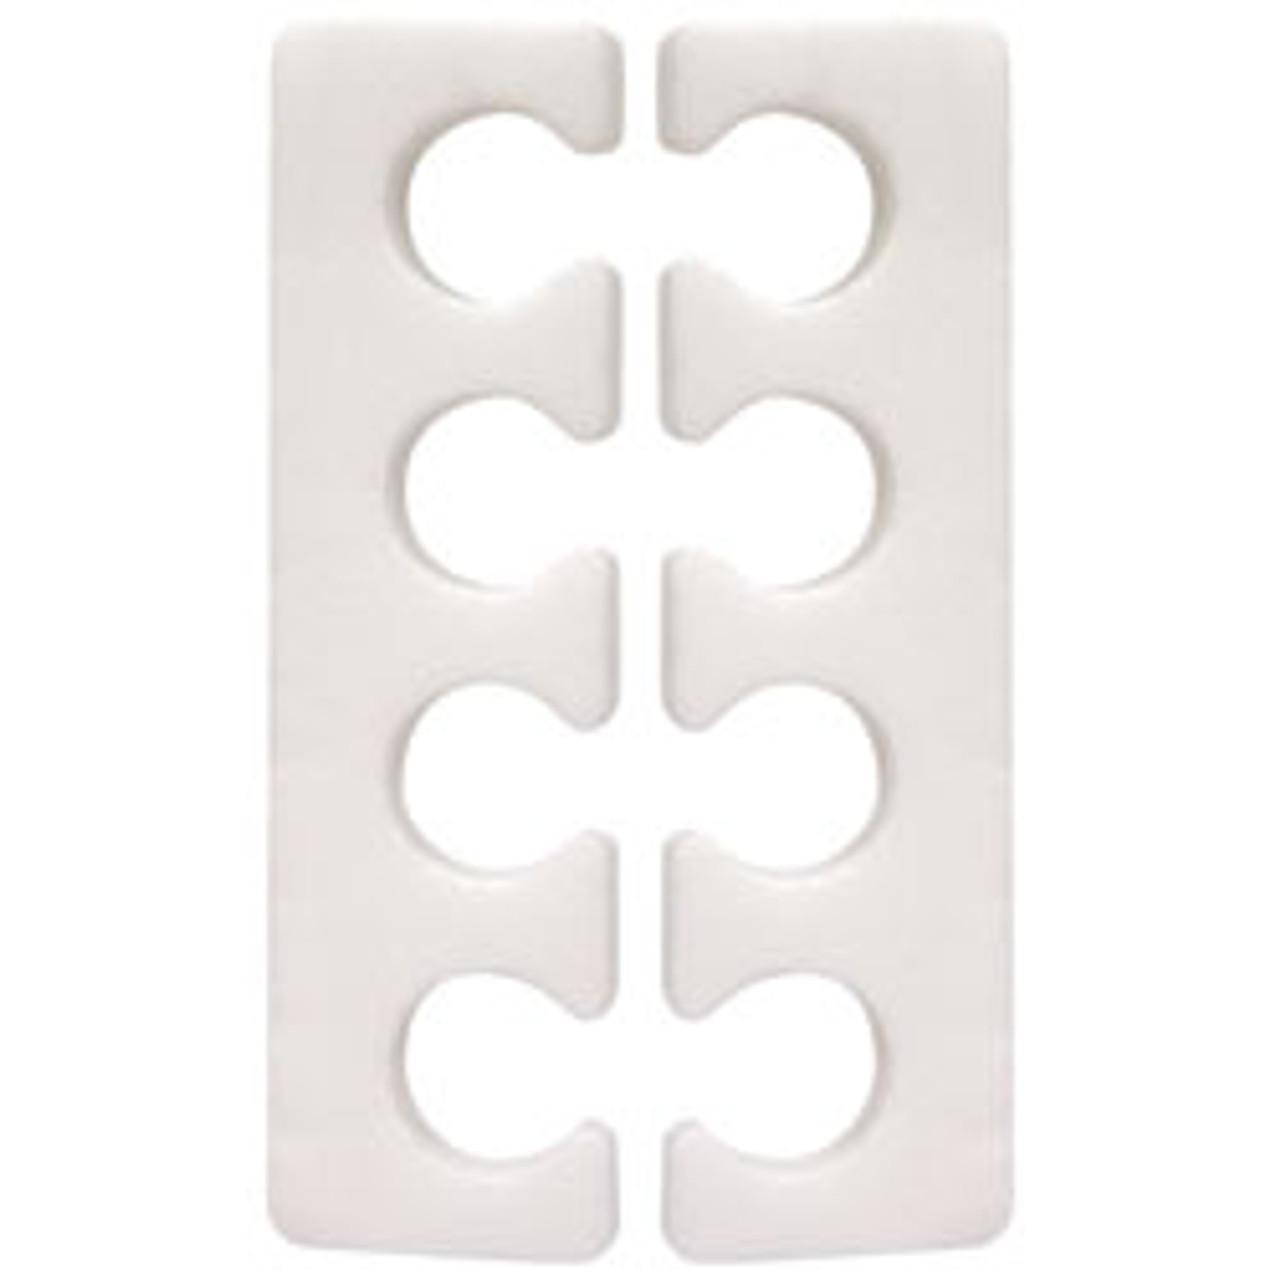 DL Pro Toe Separators, Pack of 25 Pairs